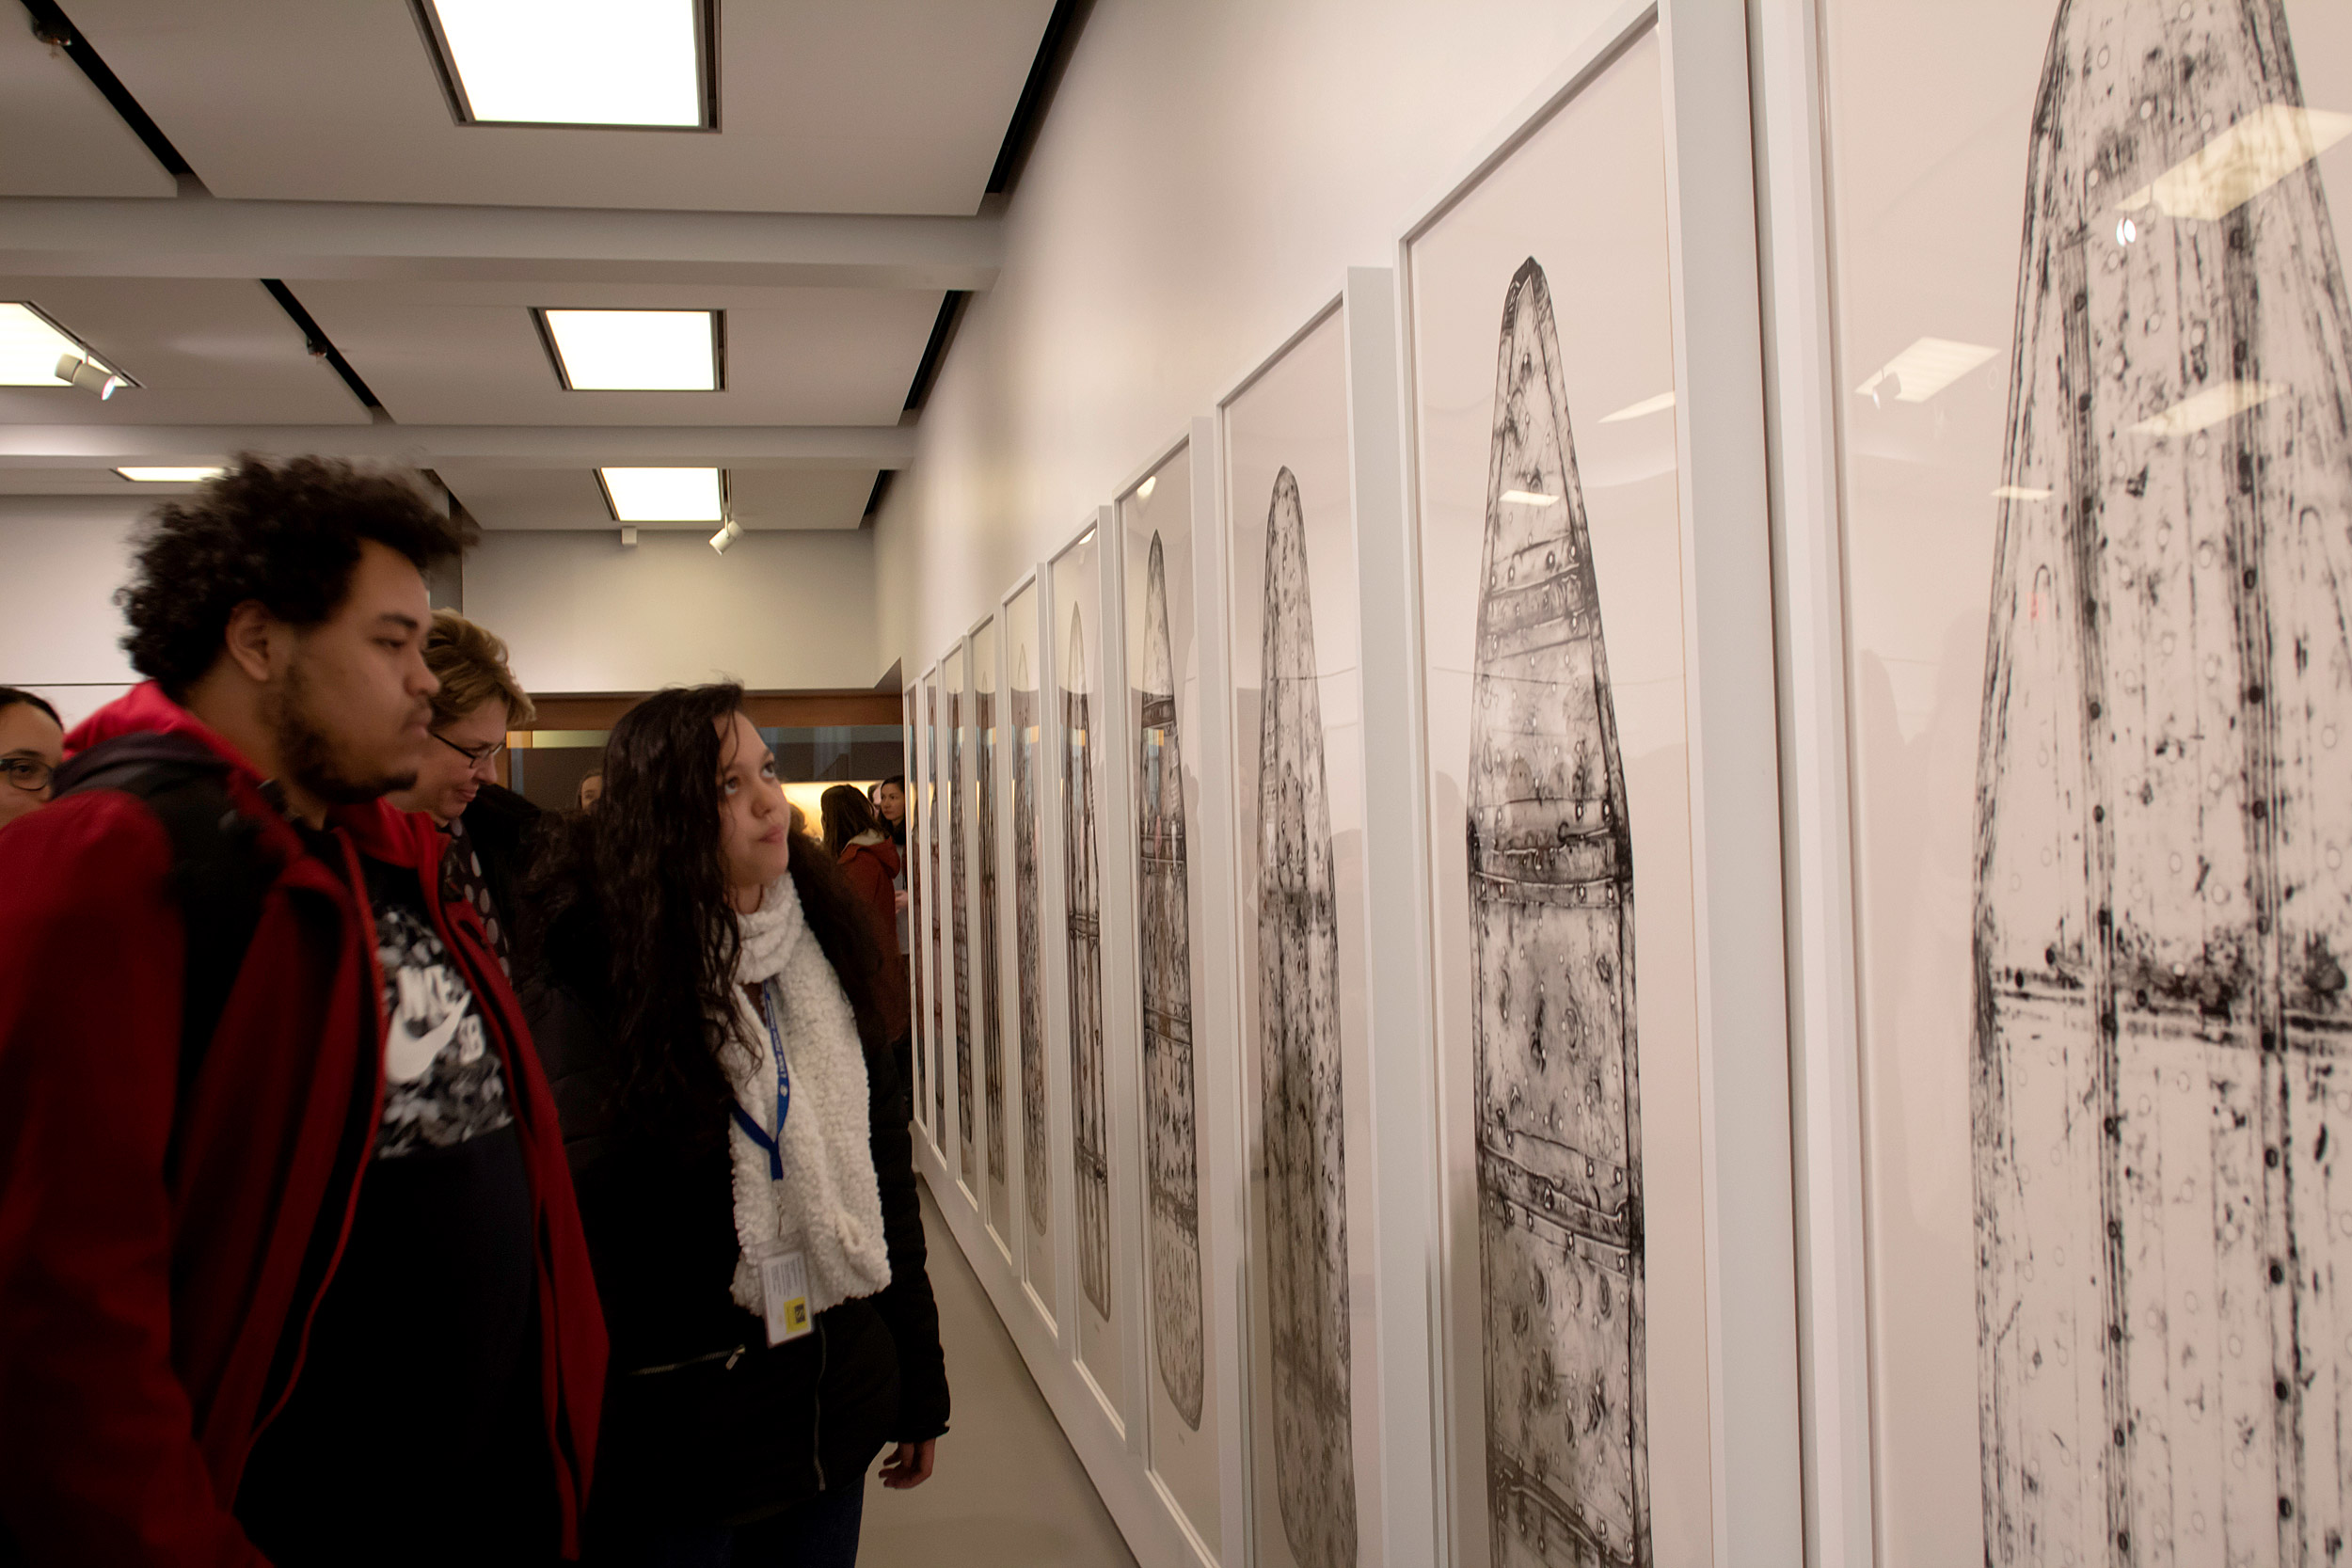 Noel Pichardo and Jasmin De La Cruz, student artists from RAW Art Works in Lynn, view the gallery.  Photo by María F. Sánchez